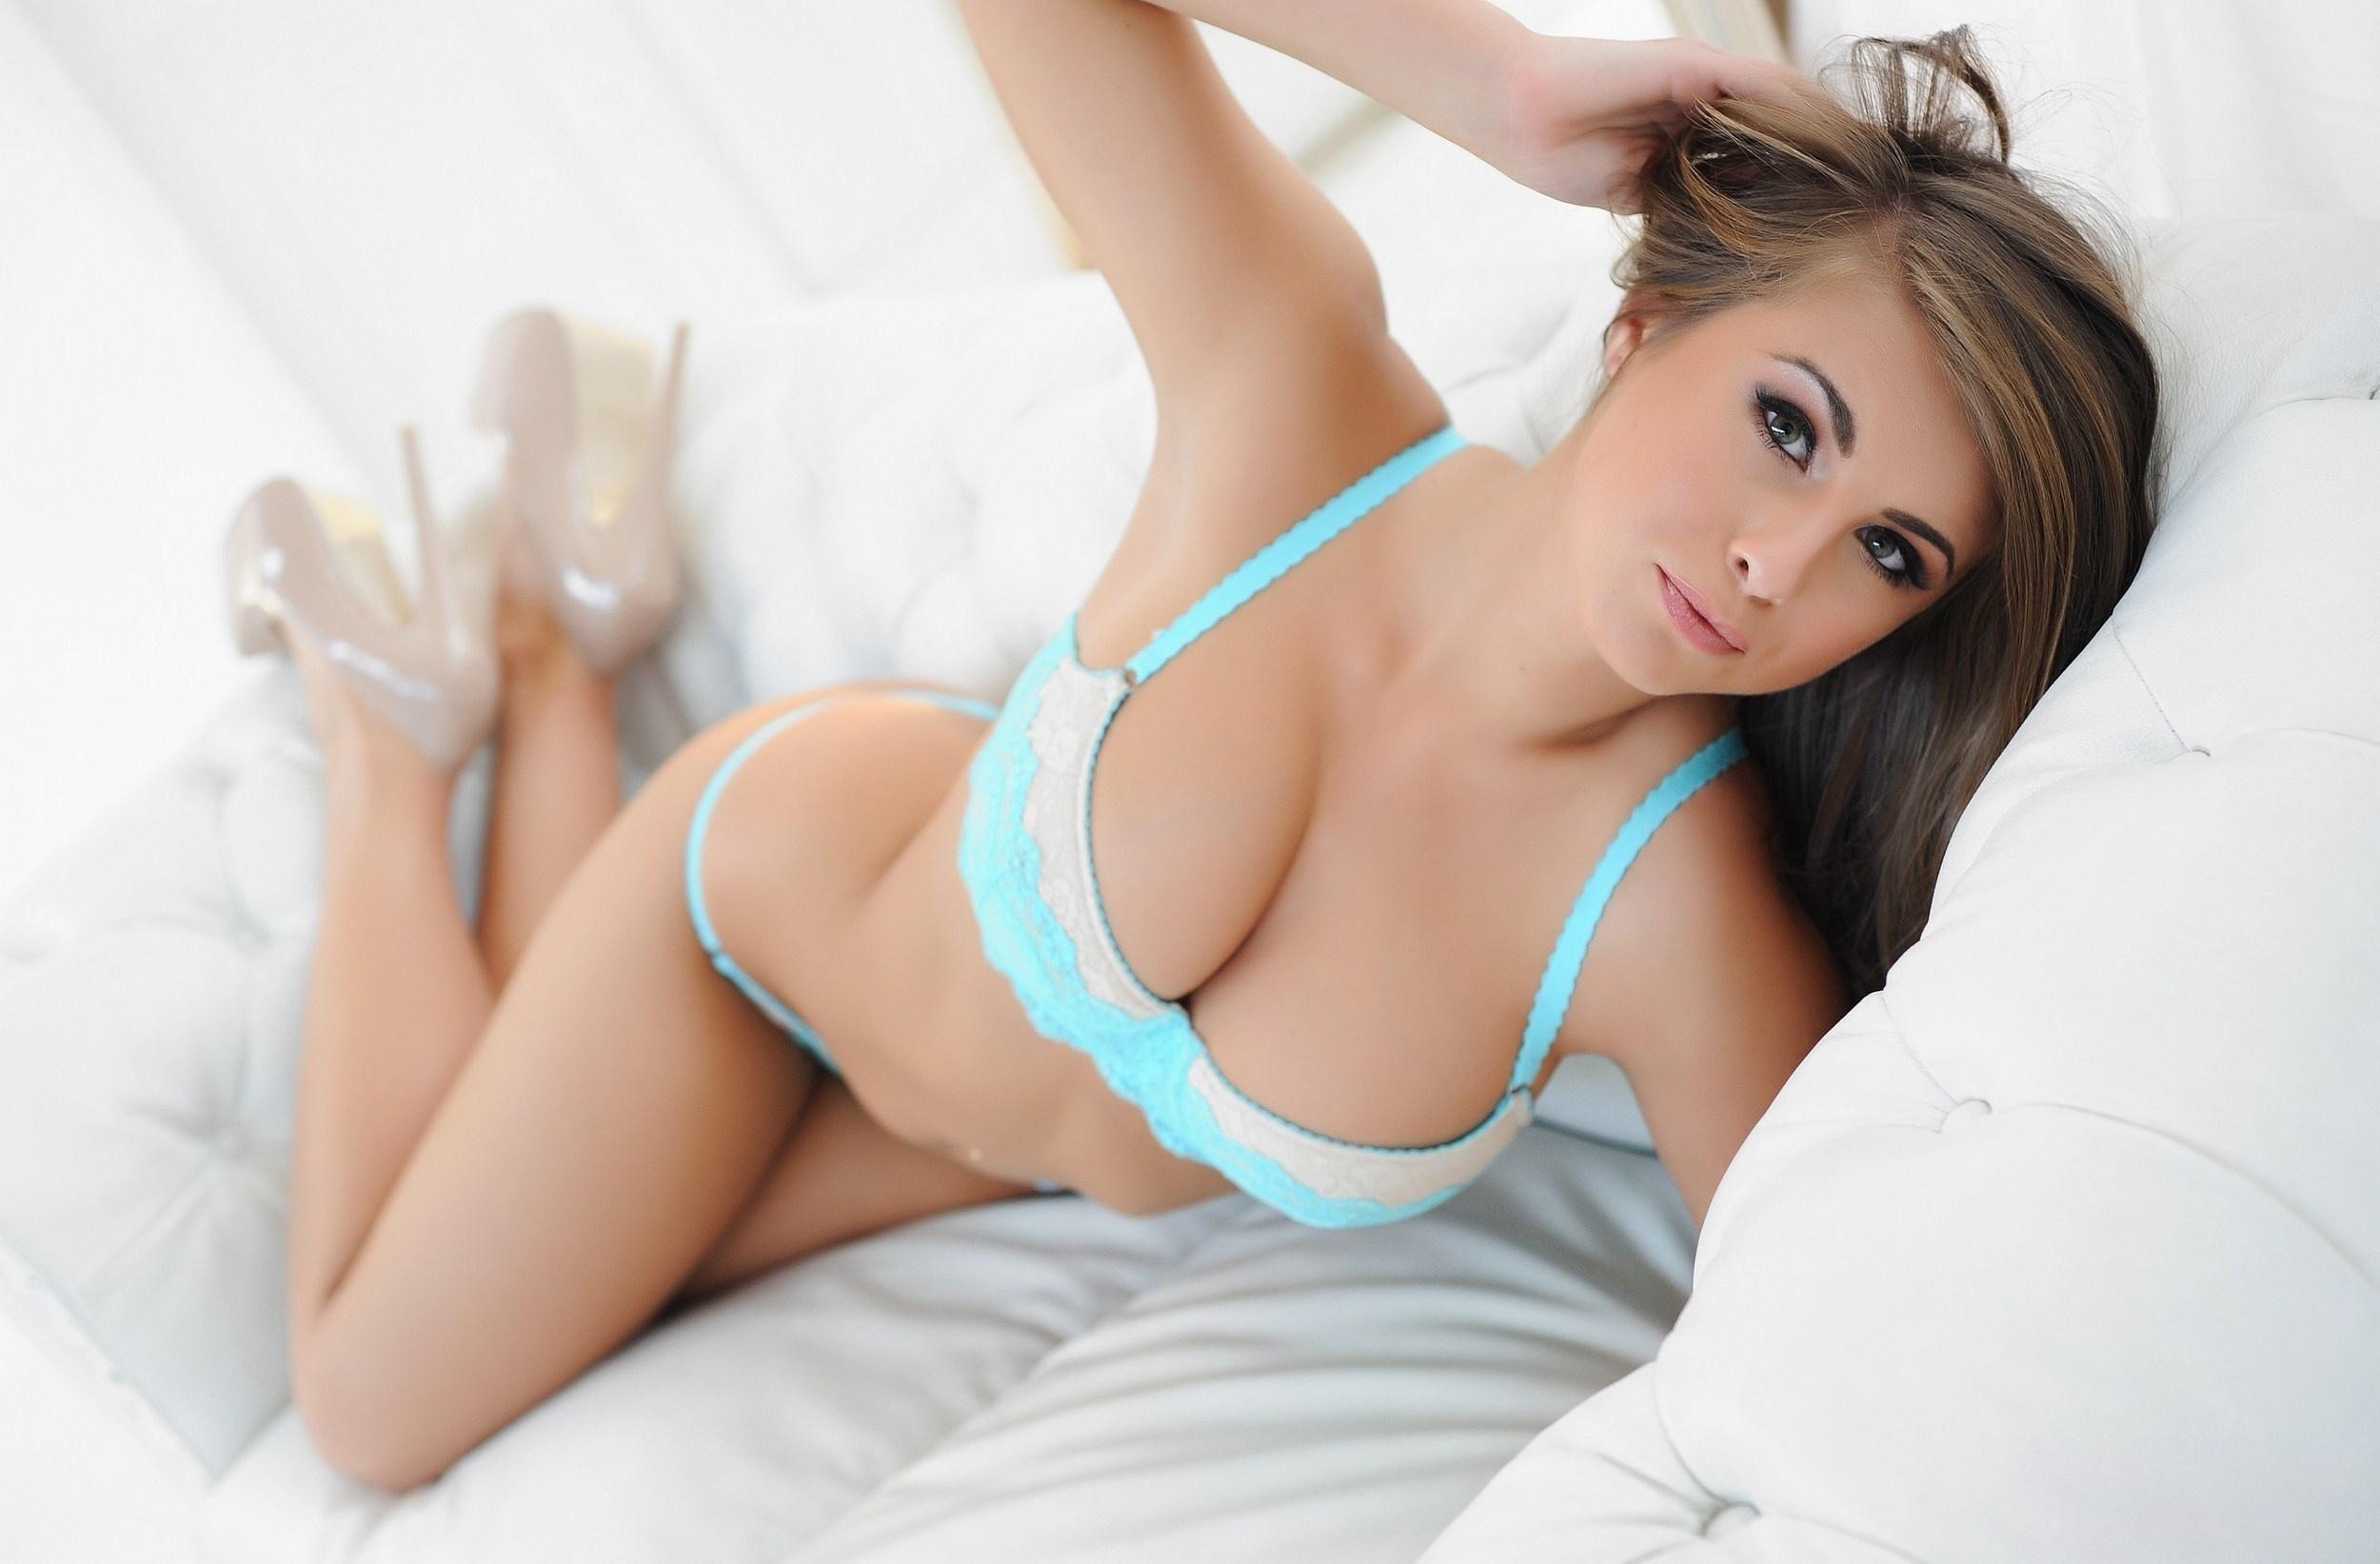 porno-zrelie-russkie-elena